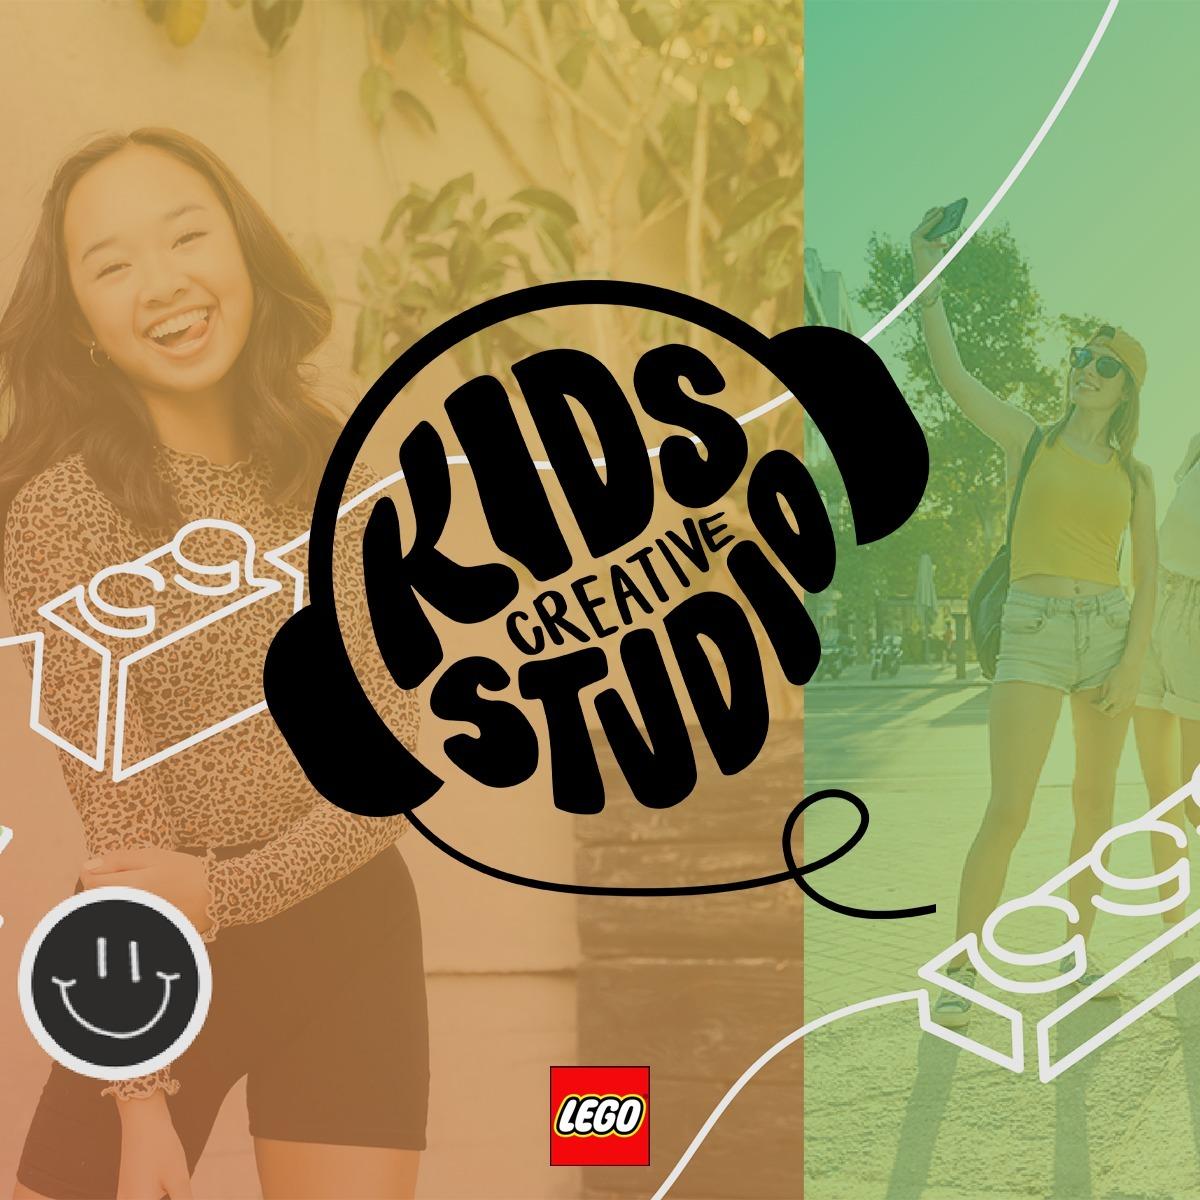 LEGO®: Kid Creative Director Search